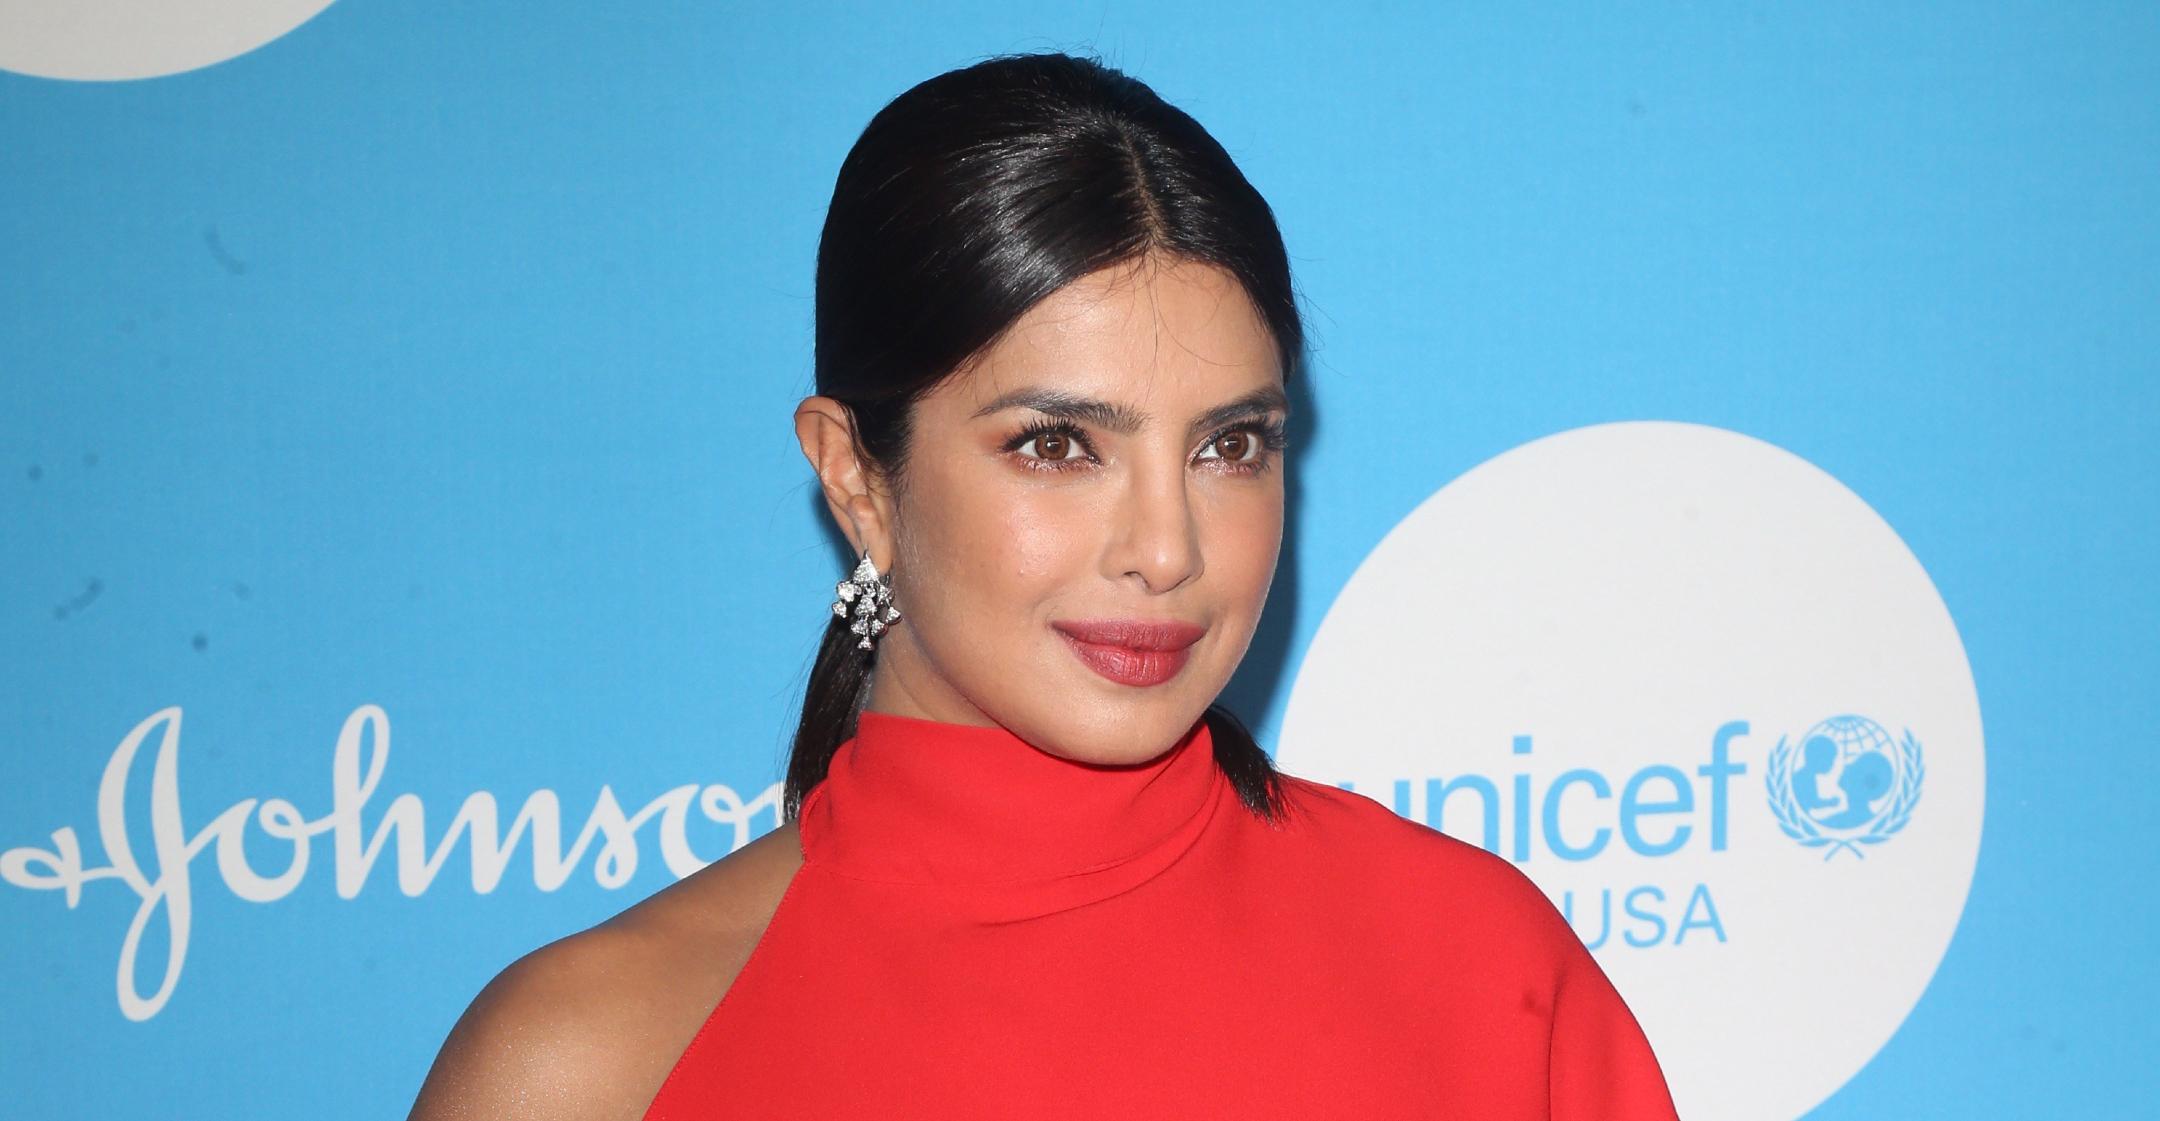 priyanka chopra helped bring inclusivity diversity to hollywood